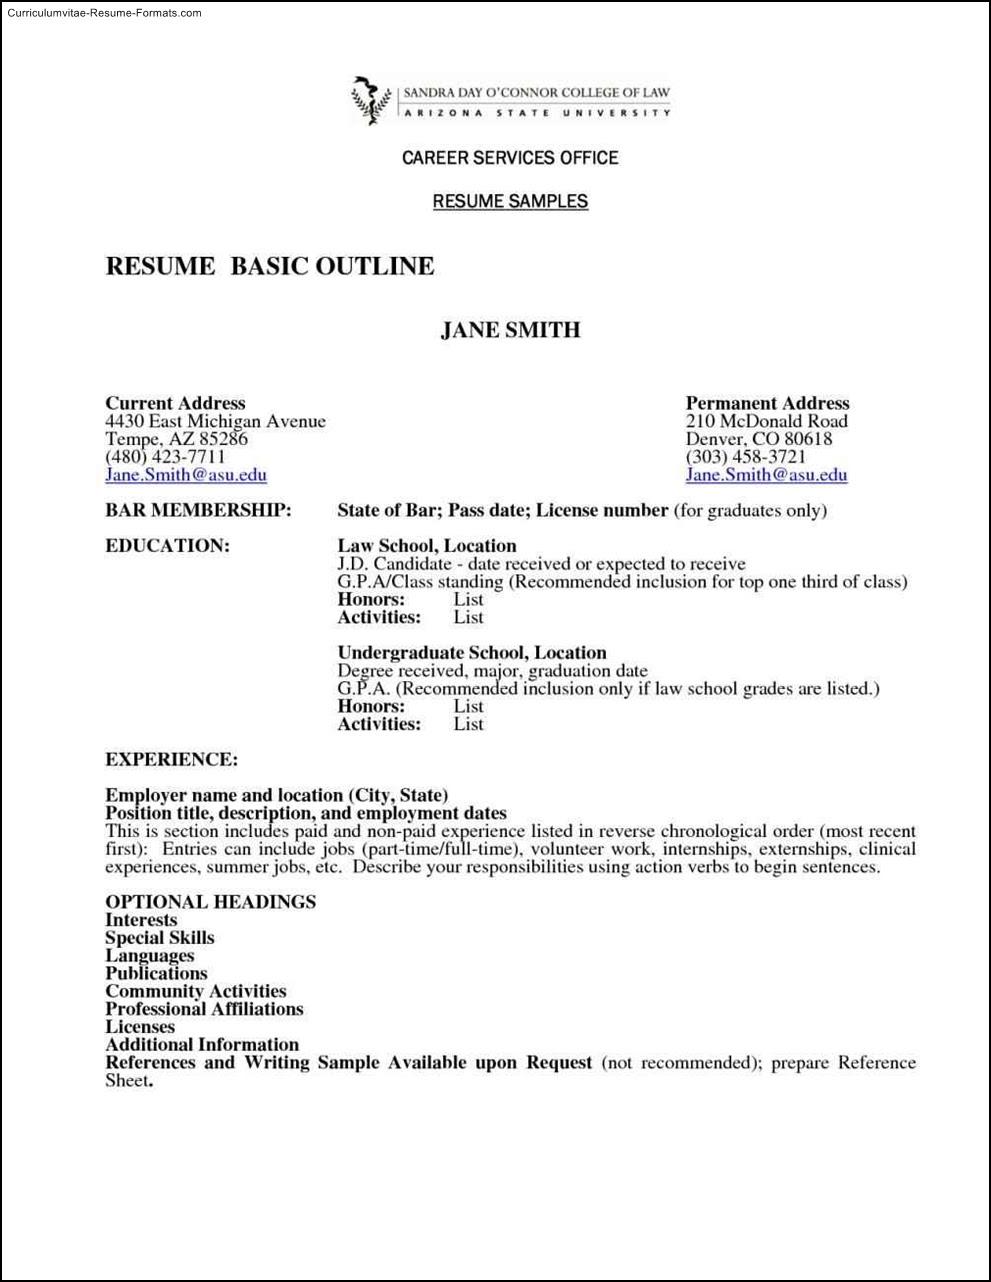 Basic Resume Template Australia  Free Samples , Examples  Format Resume \/ Curruculum Vitae